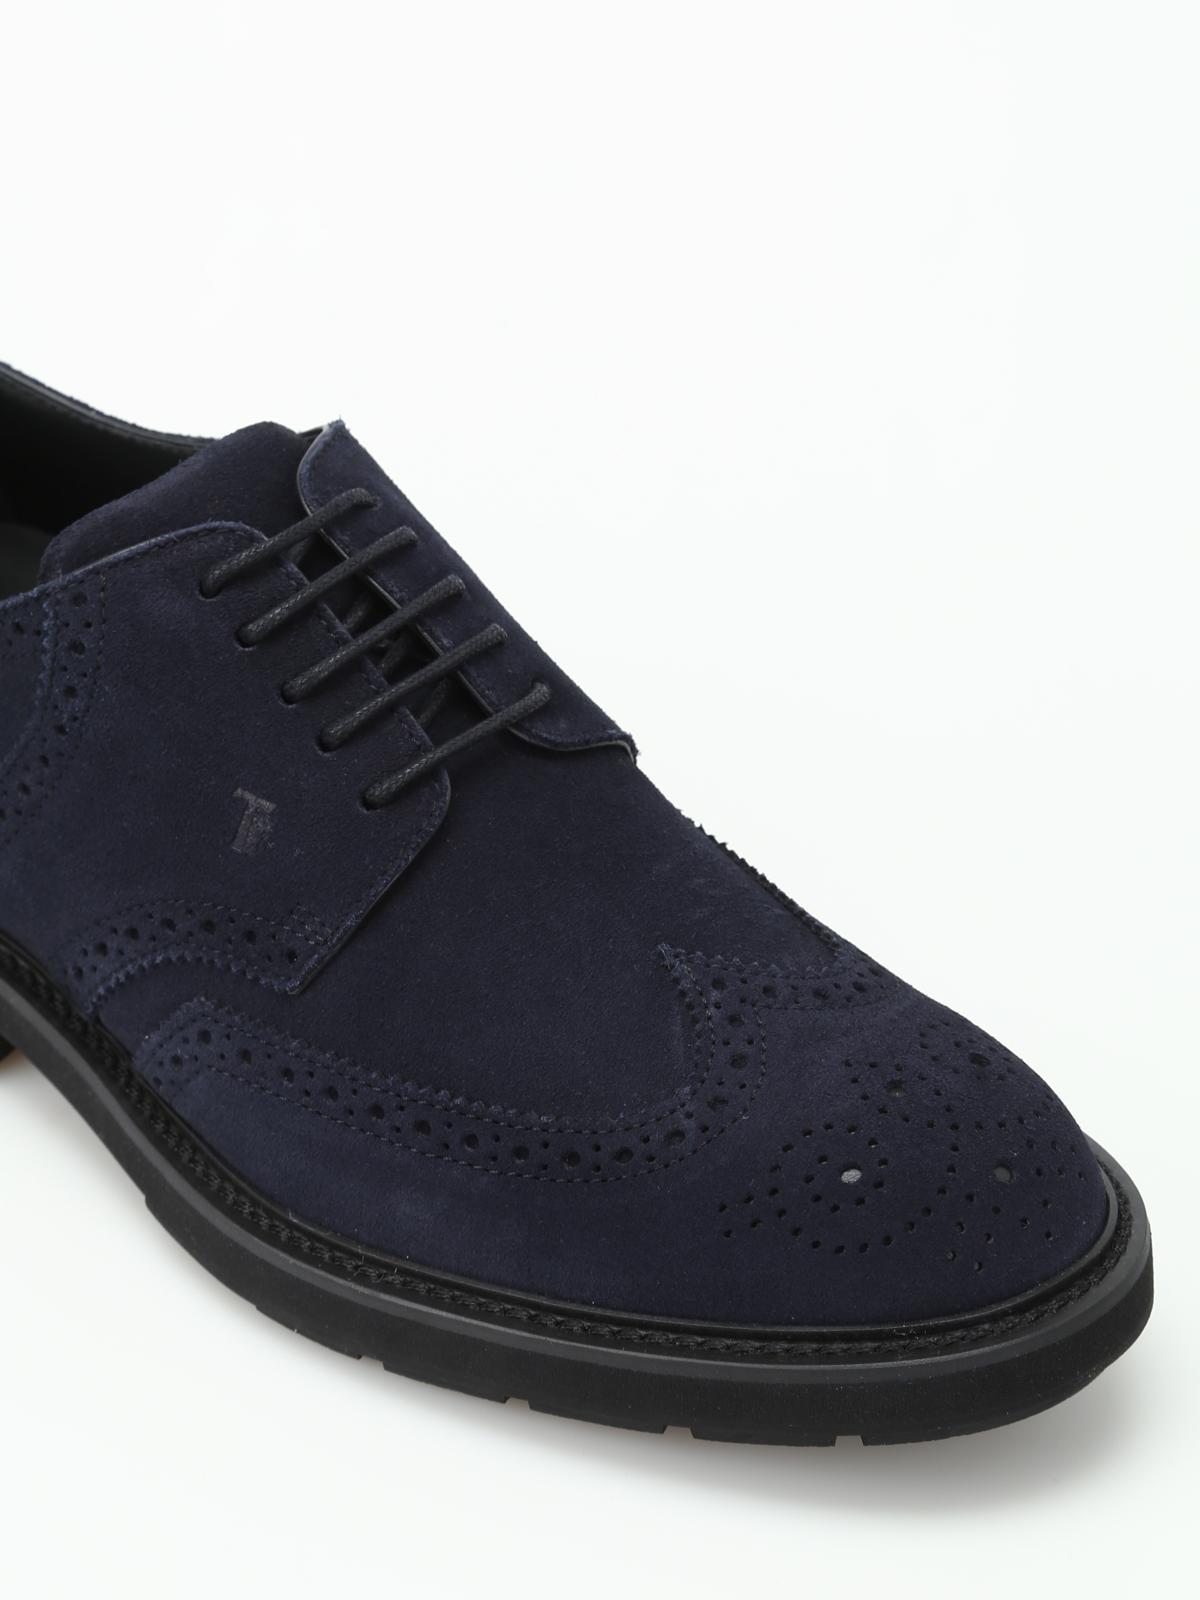 dark blue brogues